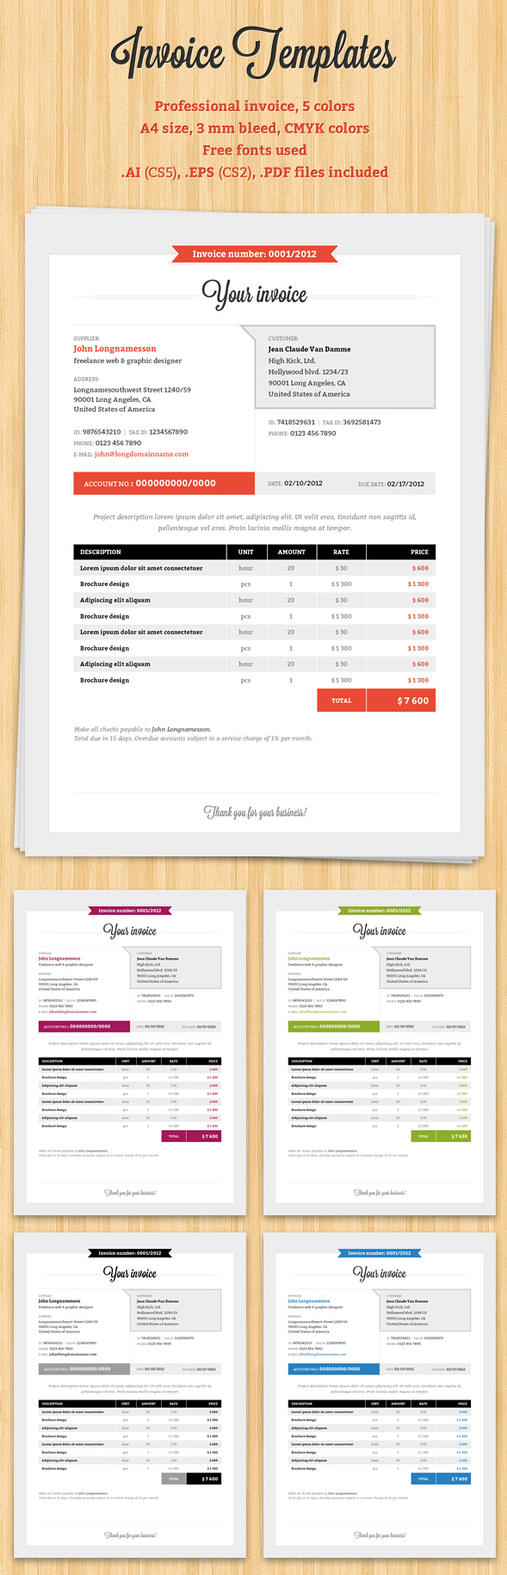 invoice template by mareklevak on deviantart. Black Bedroom Furniture Sets. Home Design Ideas